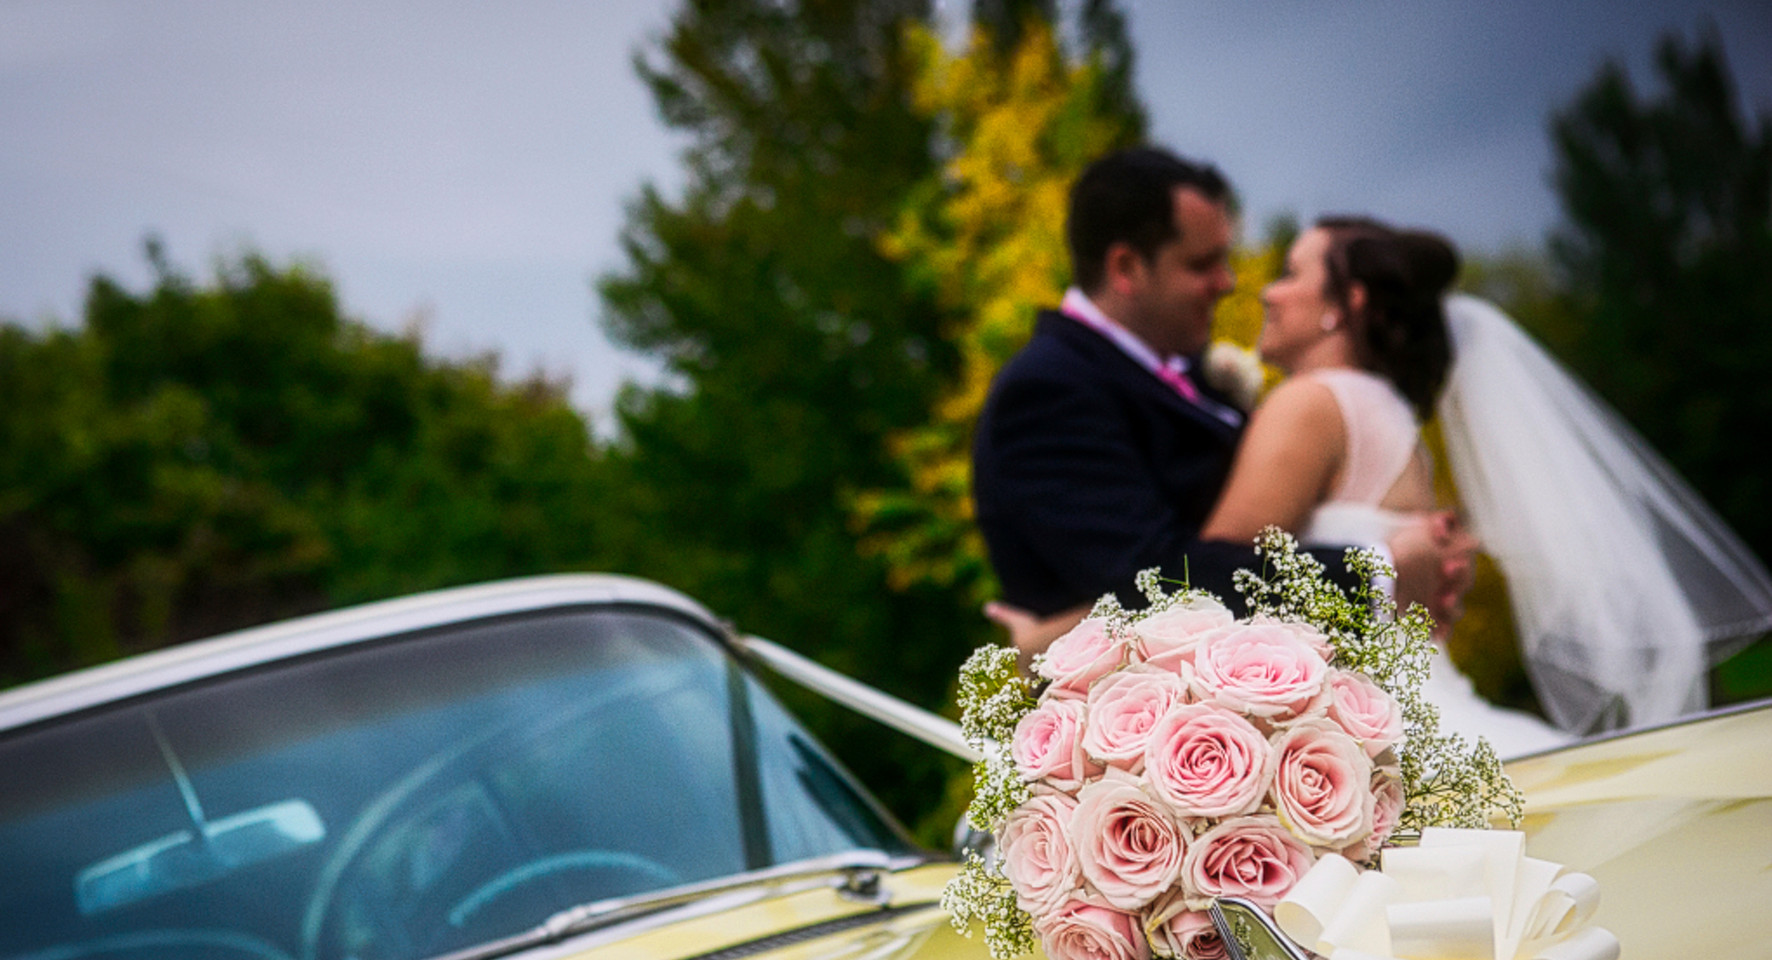 beide and groom distance kiss, car, flowers